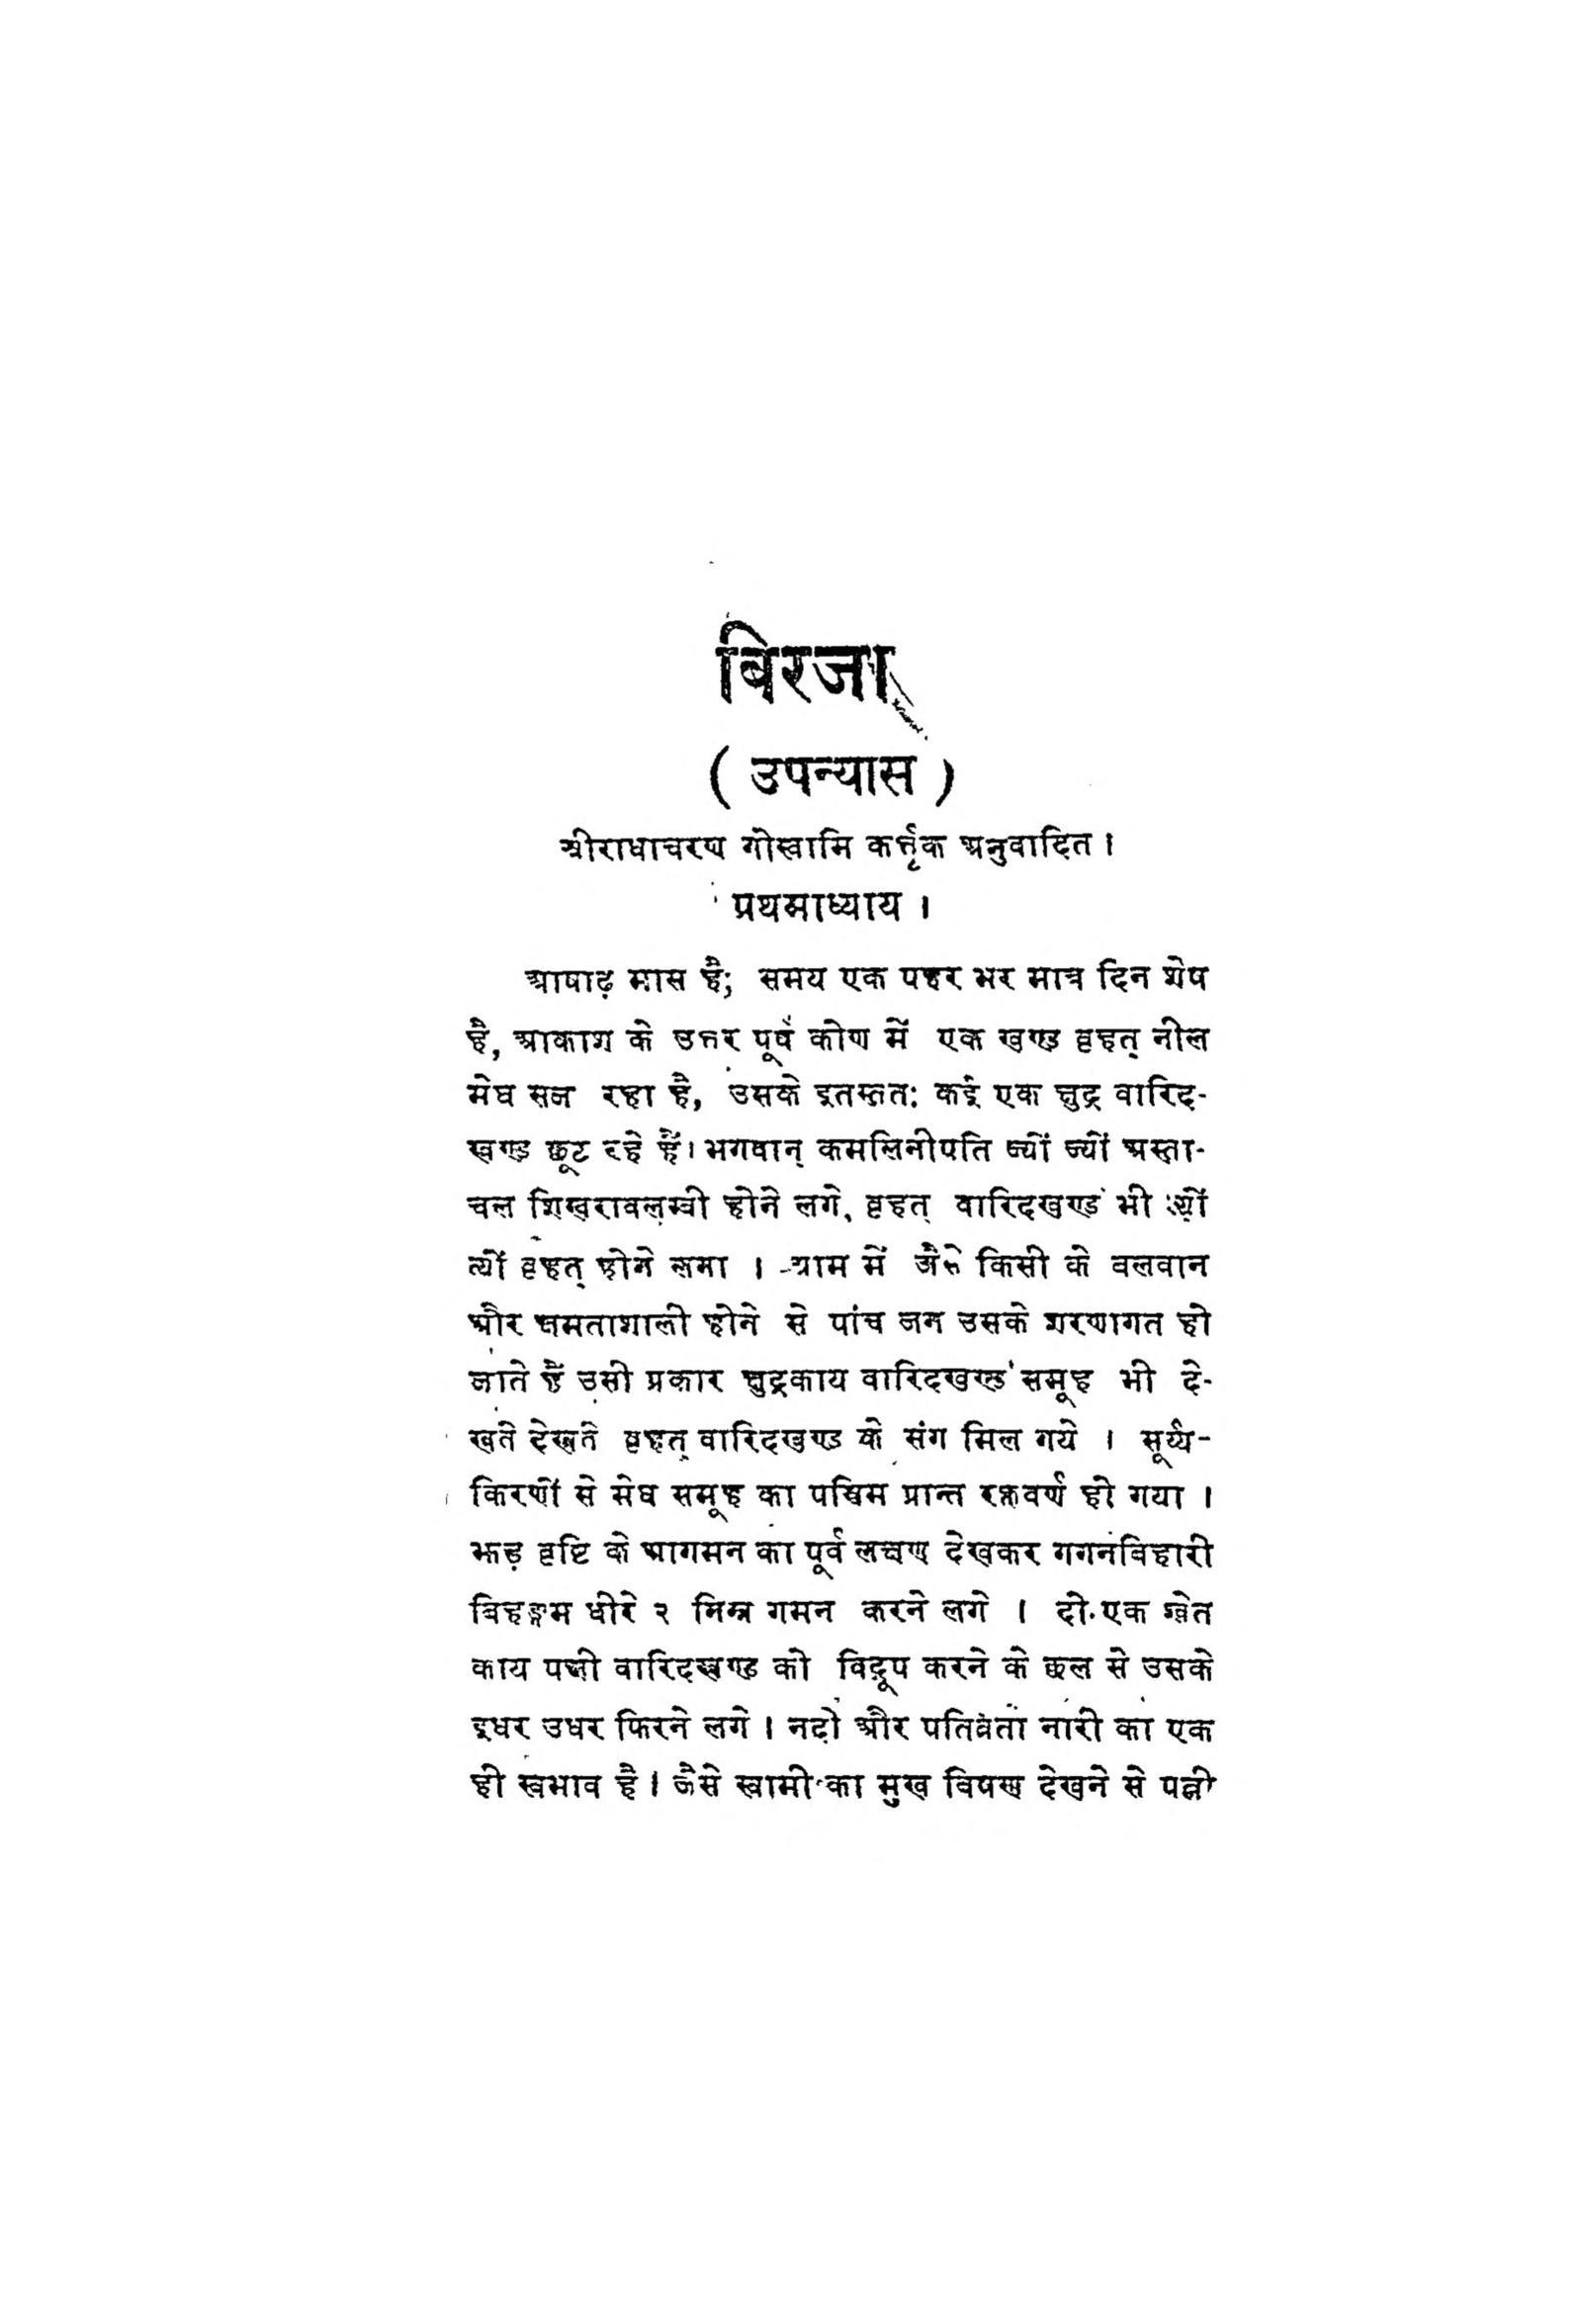 Birja  by राधाचरण गोस्वामी - Radhacharan Goswami